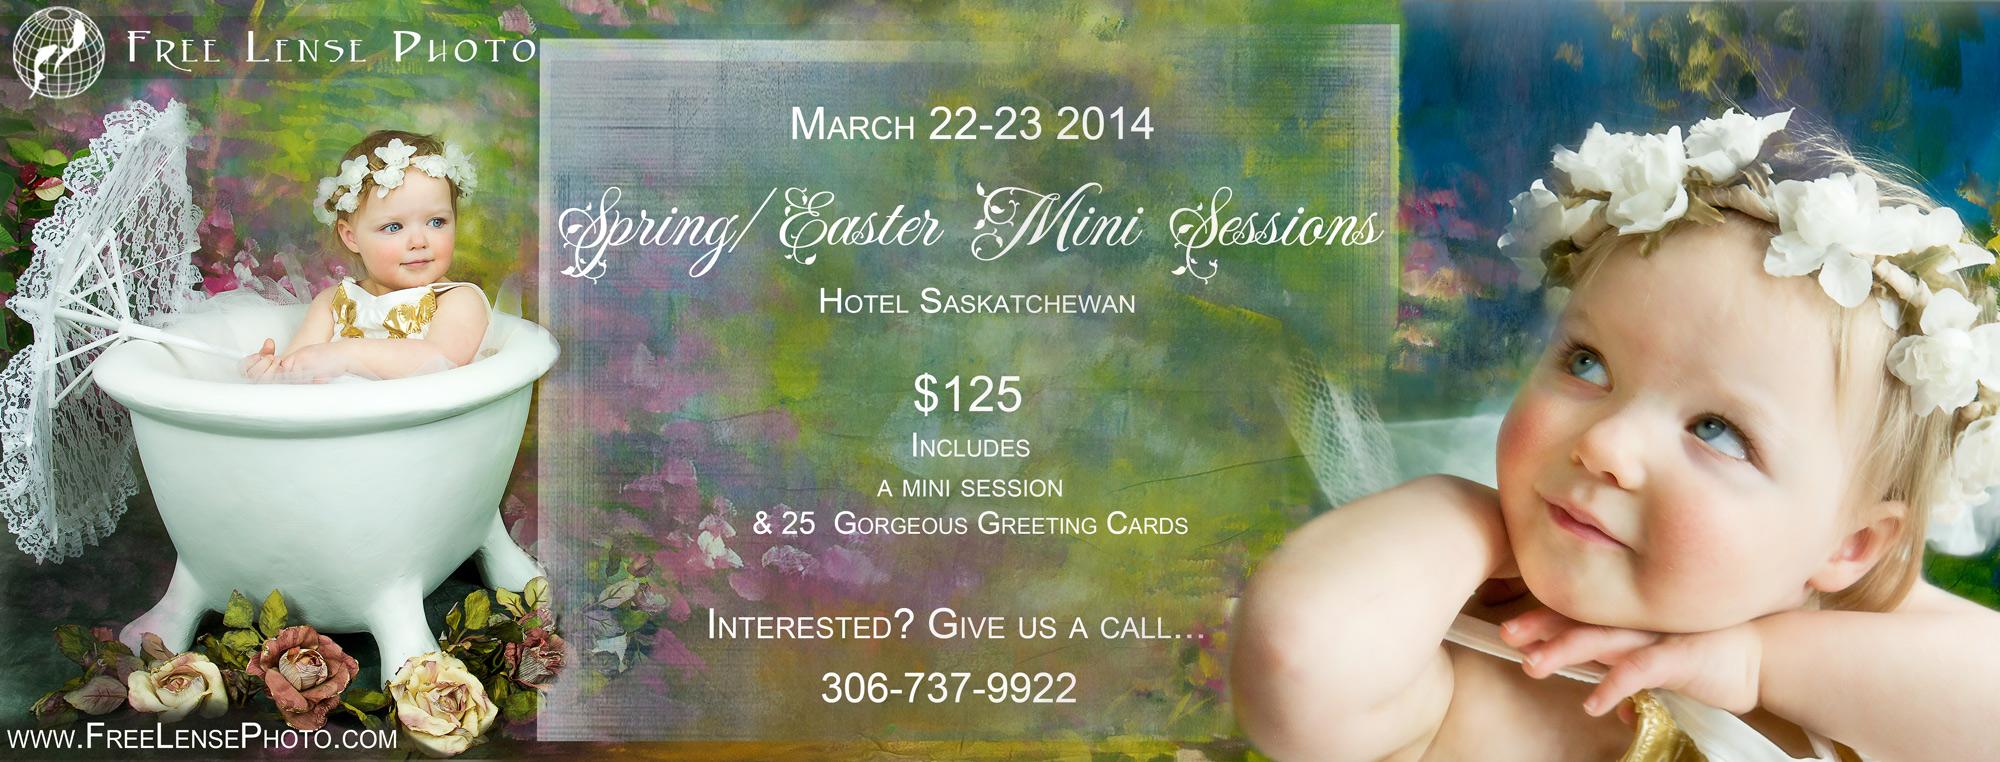 regina-spring-easter-mini-sessions.jpg